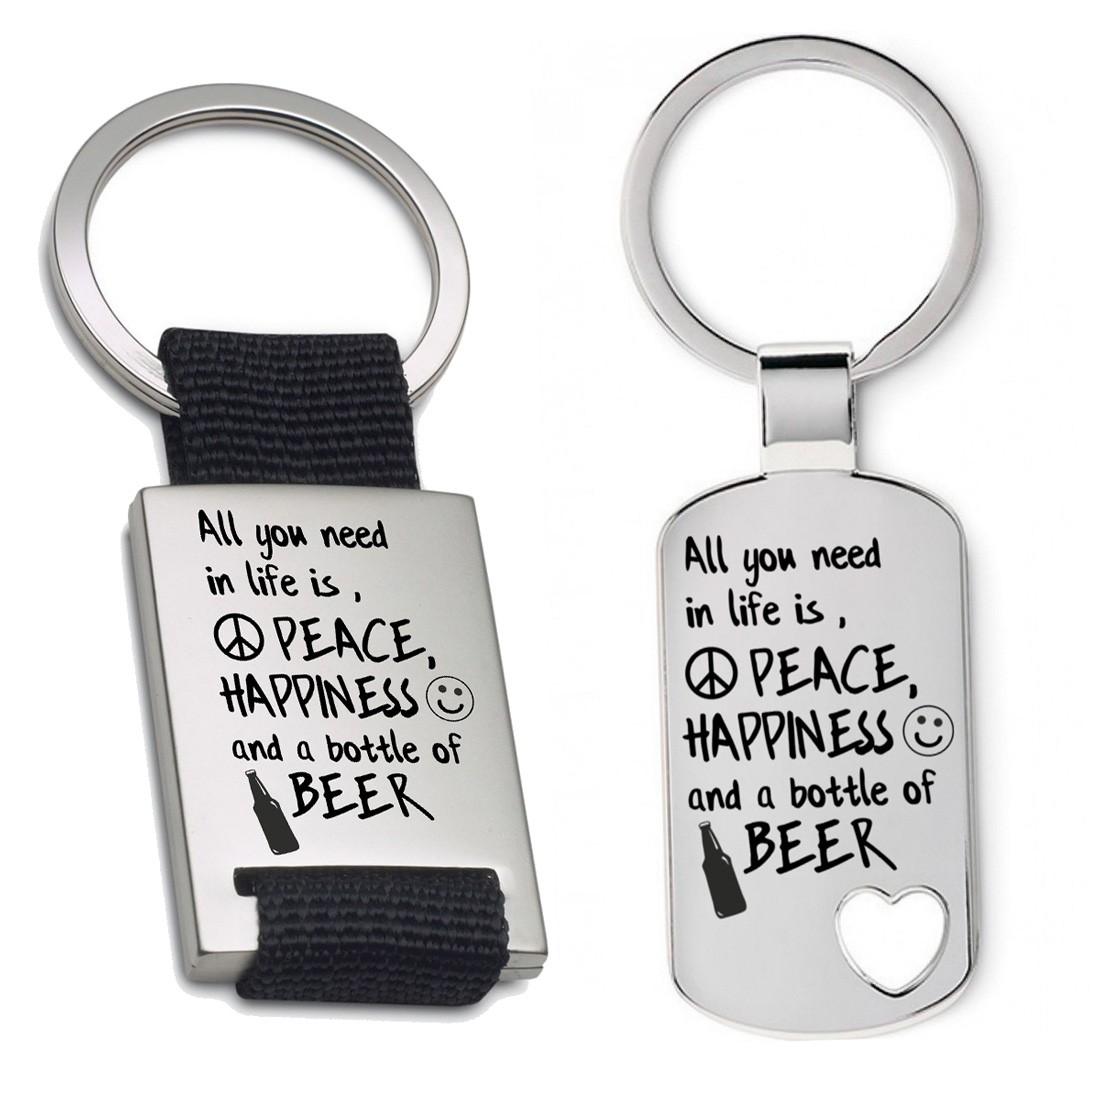 Schlüsselanhänger: Peace, happyness & beer